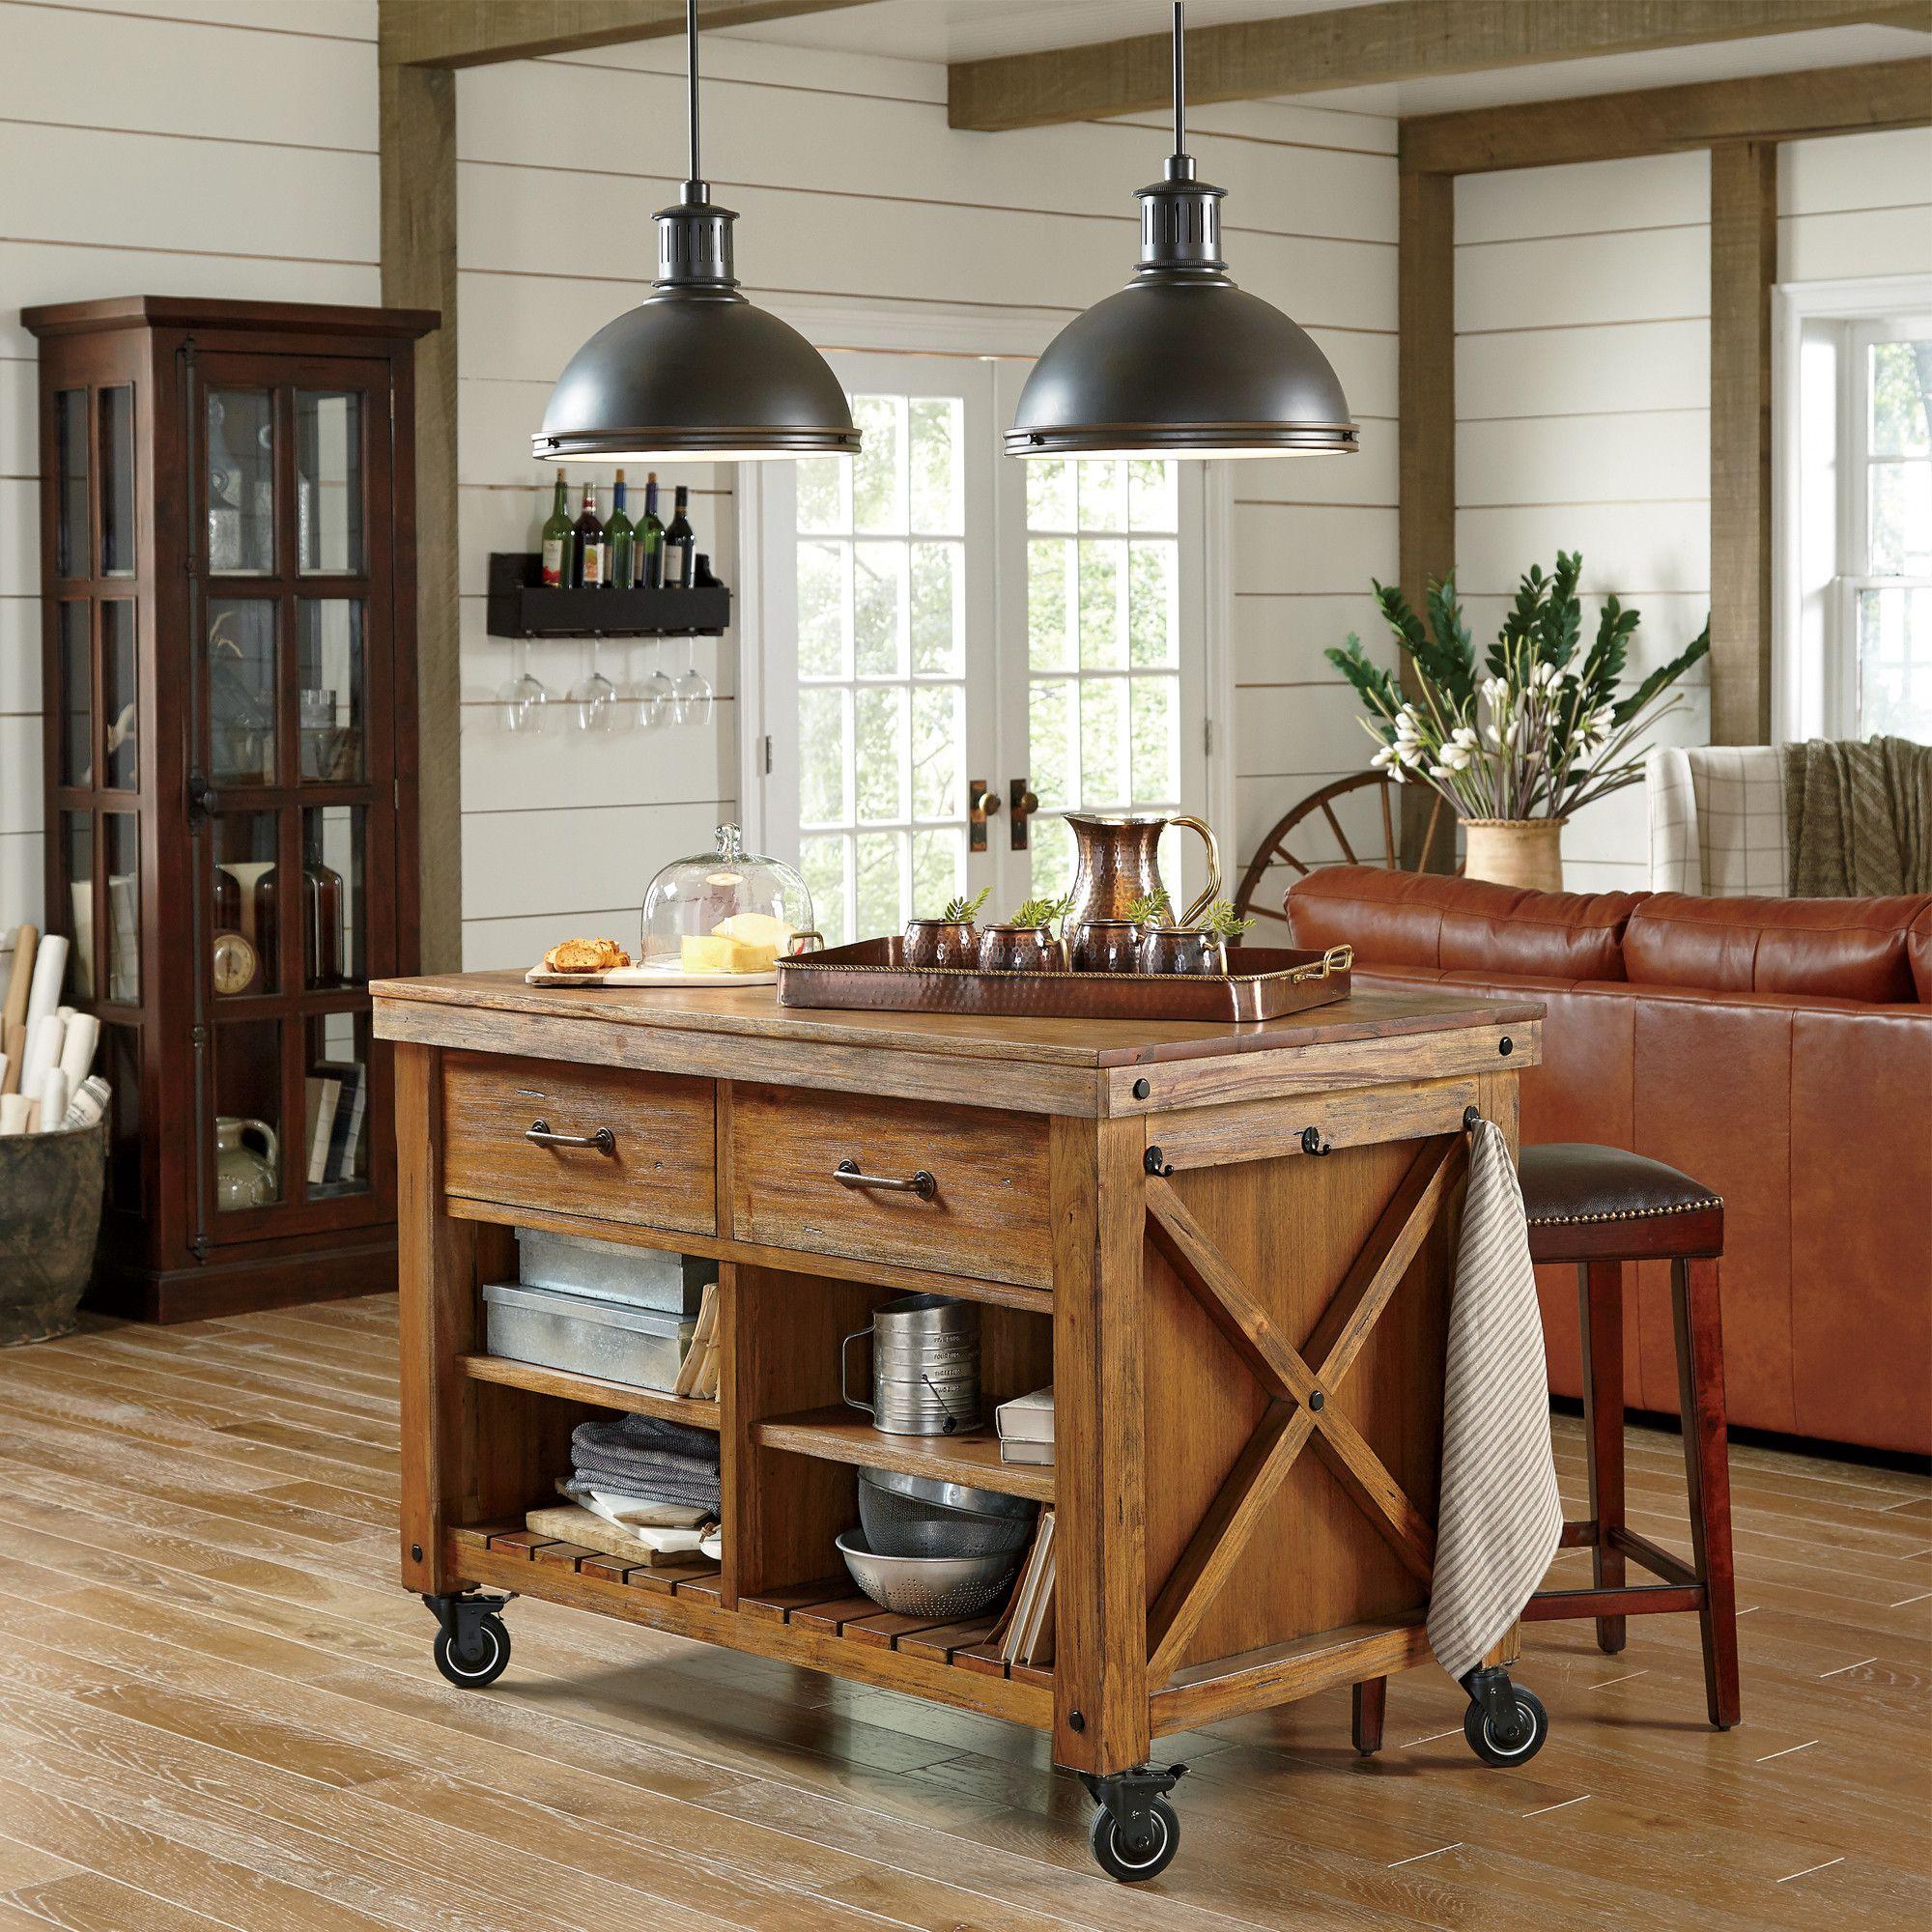 Vargas Kitchen Cart | Rustic kitchen island, Portable ...